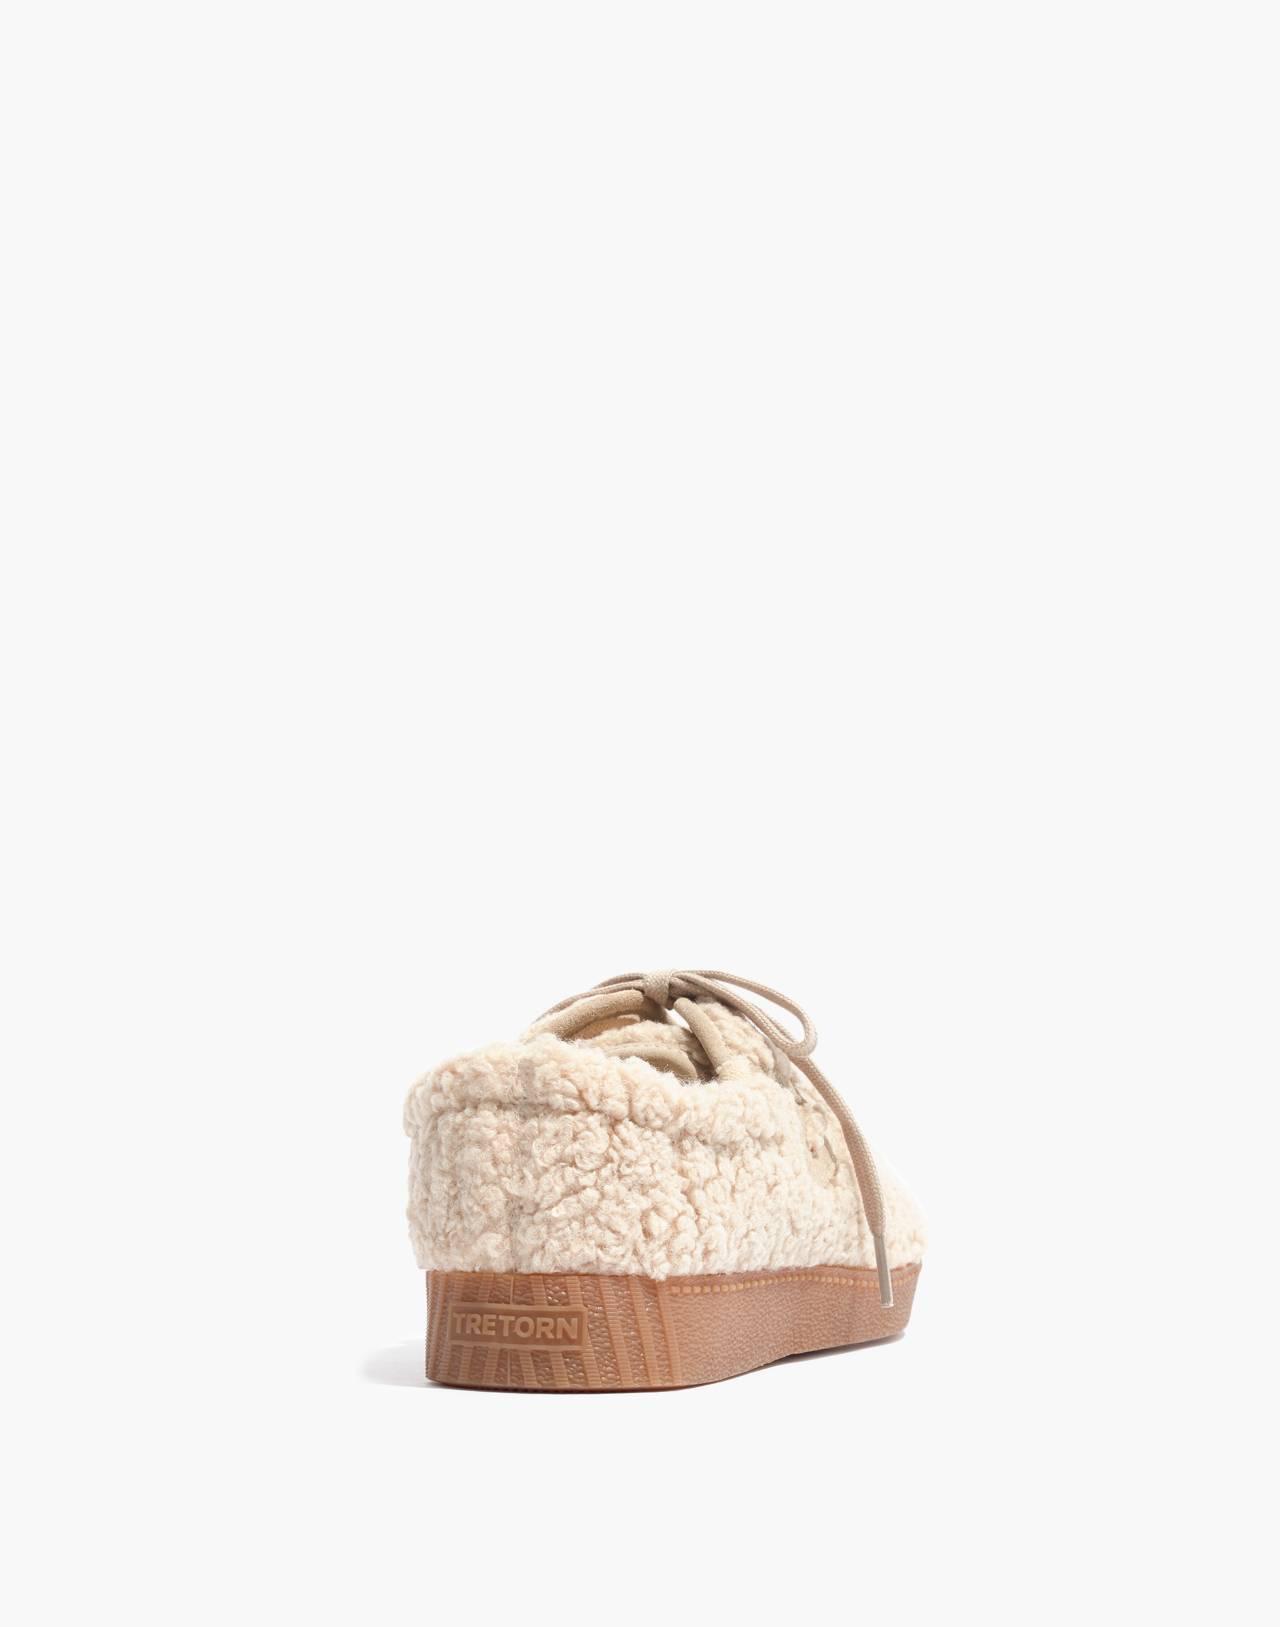 Tretorn® Nylite Plus Sneakers in Cream Faux Shearling in cream image 3